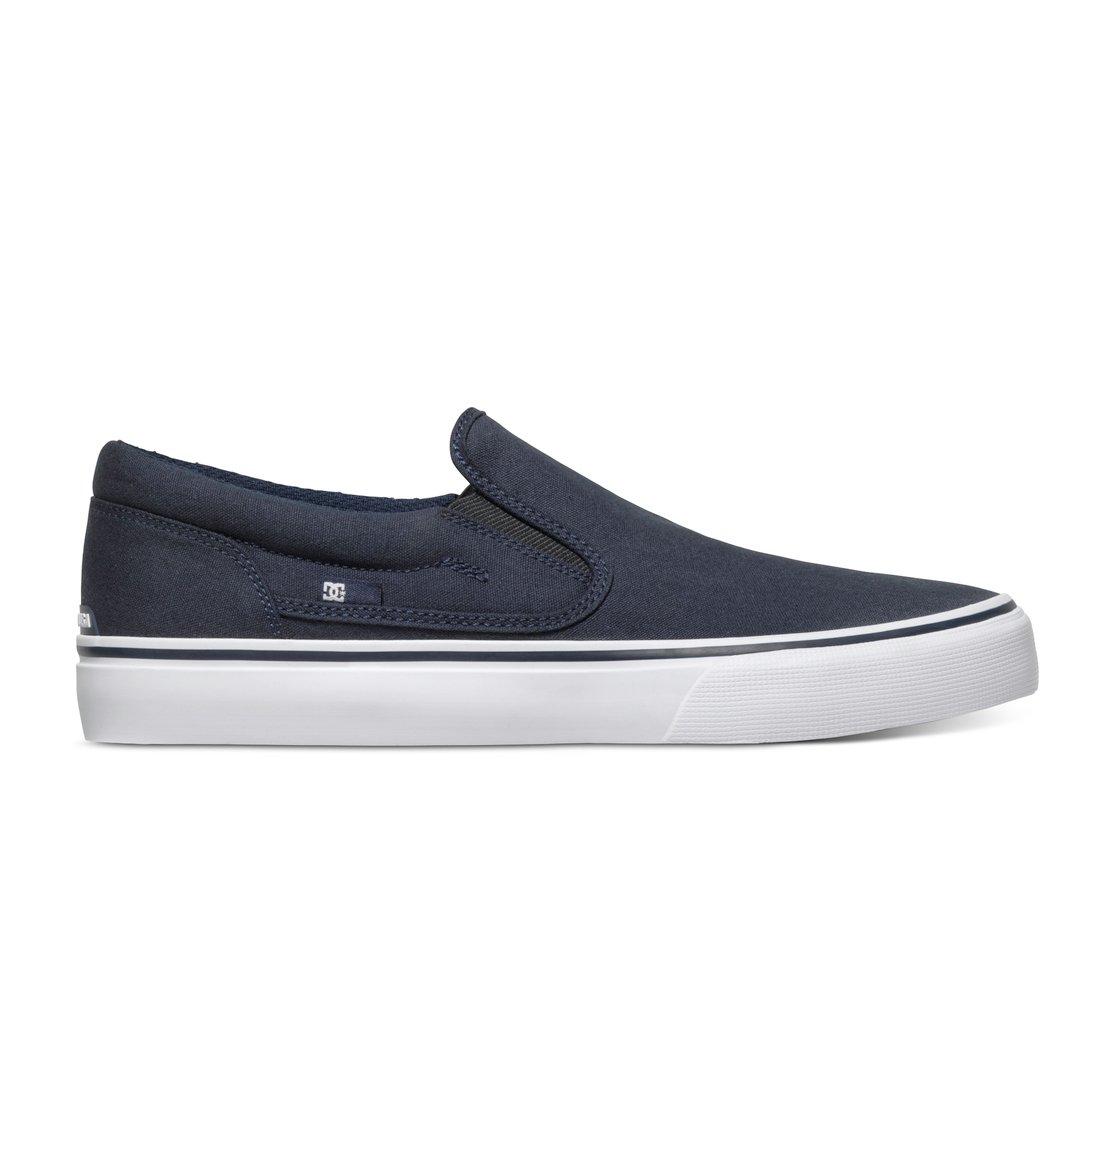 Trase - Dcshoes������ ������� ���� Trase �� DC Shoes. <br>��������������: ��������������� ������, ������� ��������������� ����, ������� DCSHOECOUSA �� �����, ��������� ������ DC �� �������, ������� ���������� ����� �� �������� ���� �������, ������ ����������� ����, ���������� �������, ����� � ���������, ���������� �� ����� � ����������� ���������, ����������������� �����������, ������������� ���������� �������, ��������� ������� ���������� ������� DC Pill Pattern. <br>������: ����: �������� / ���������: �������� / �������: ������.<br>